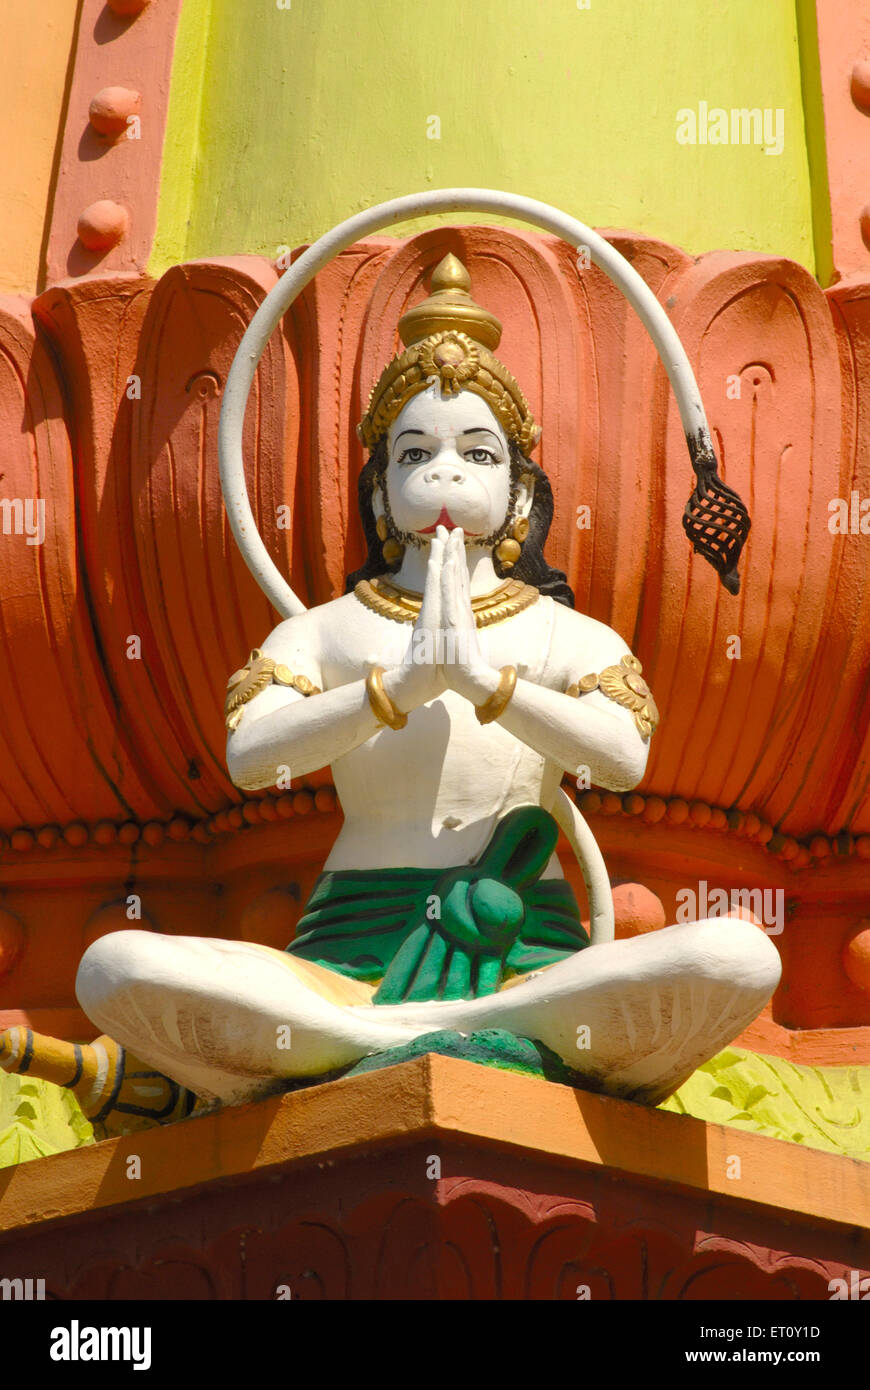 Colourfully painted stucco figure lord Hanuman sitting Namaskar posture ; monkey god ; Maruti temple foothill Parvati - Stock Image